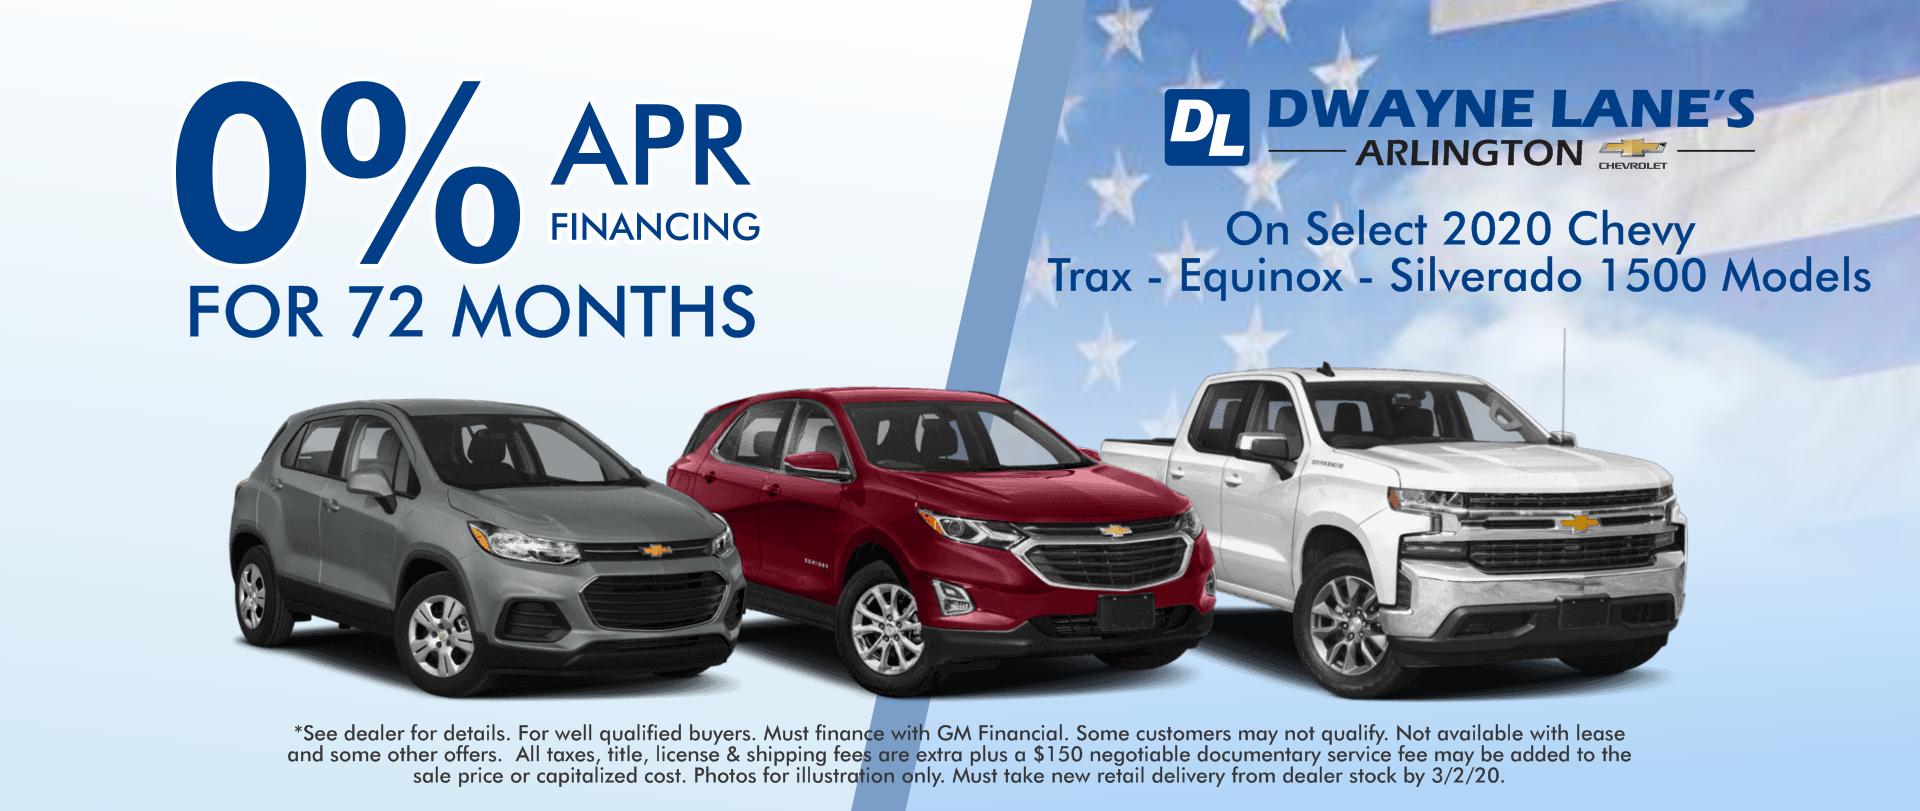 Dwayne Lane's Arlington 2020 Chevy Trax - Equinox - Silverado 0% APR for 72 months